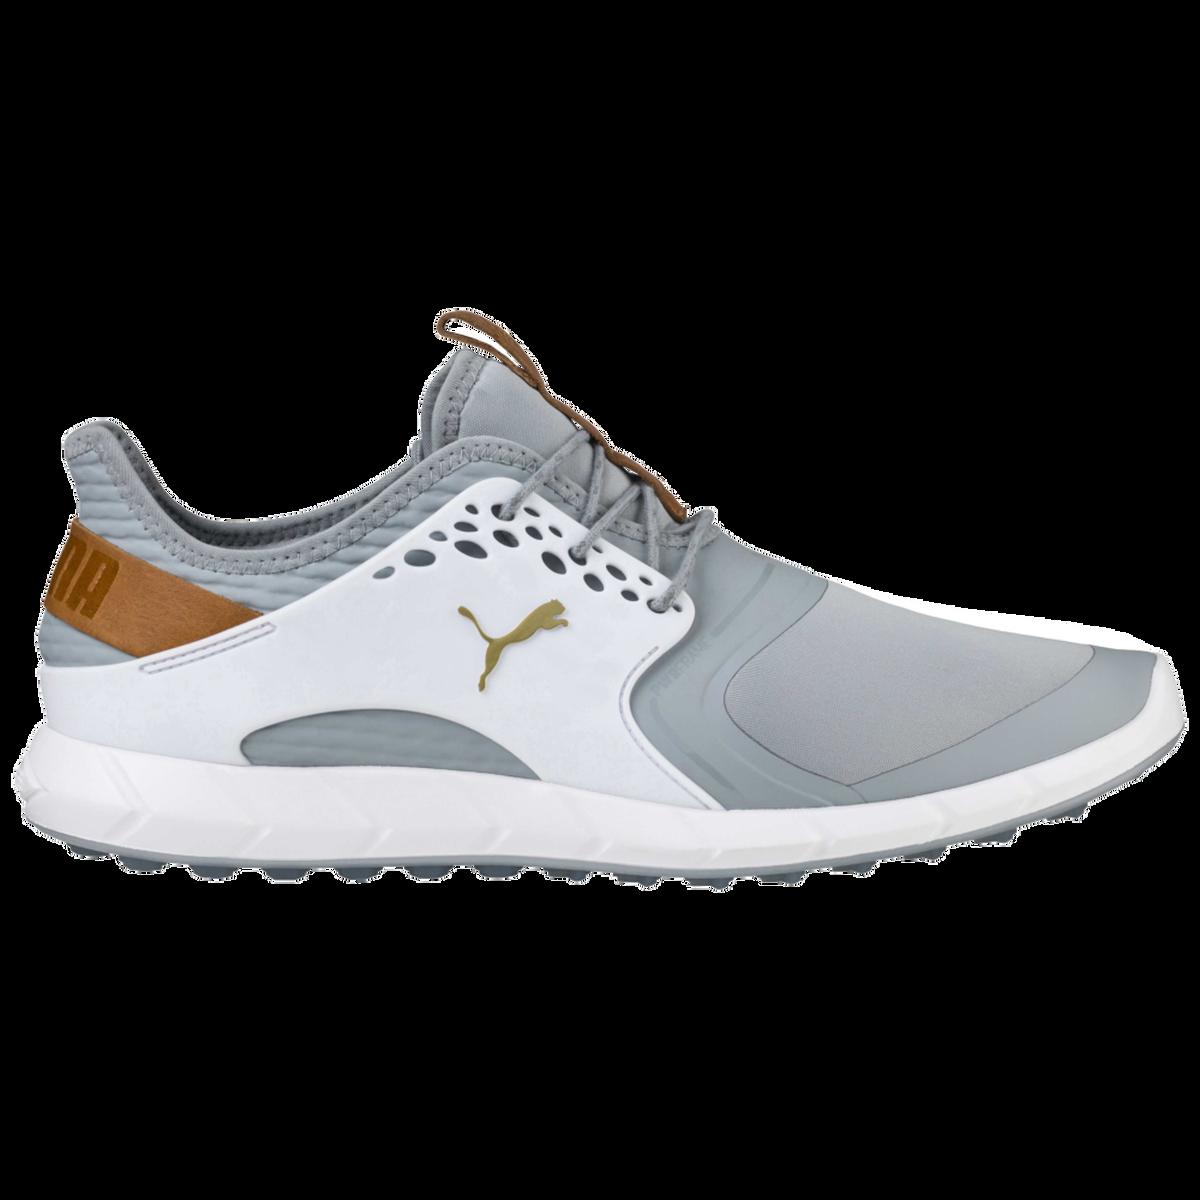 844ac8d92b PUMA IGNITE PWRSPORT Men's Golf Shoe - Grey/White